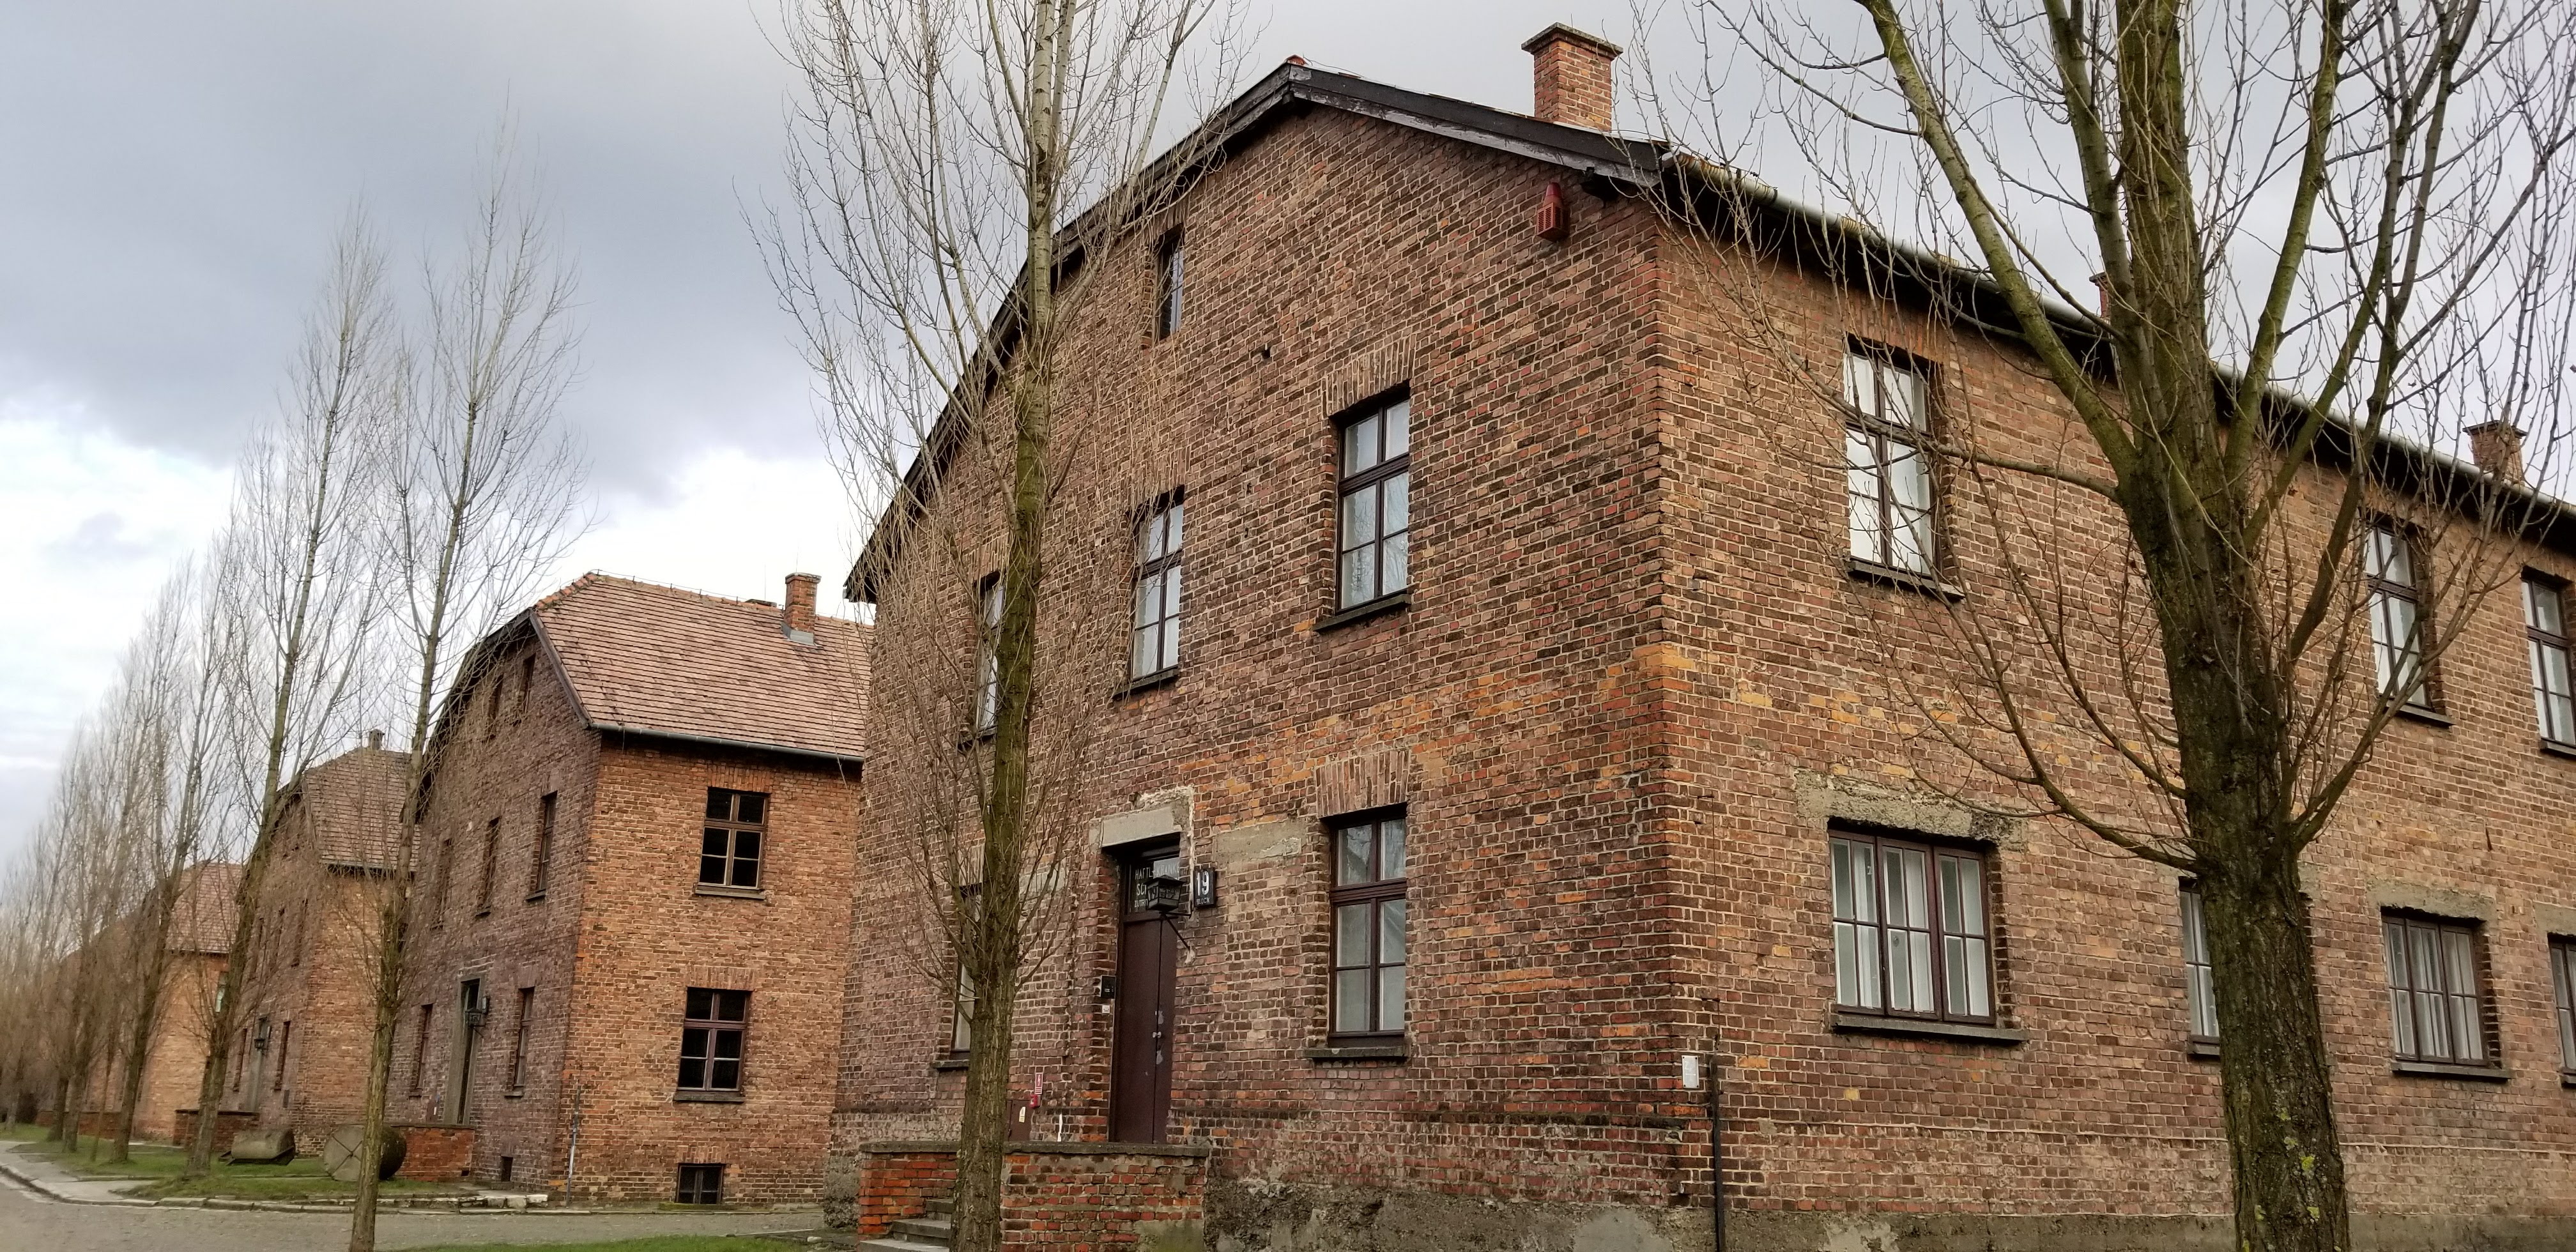 CAPAStudyAbroad_London_Fall2017_From Thaddeus Kaszuba - The Block Houses in Auschwitz.jpg